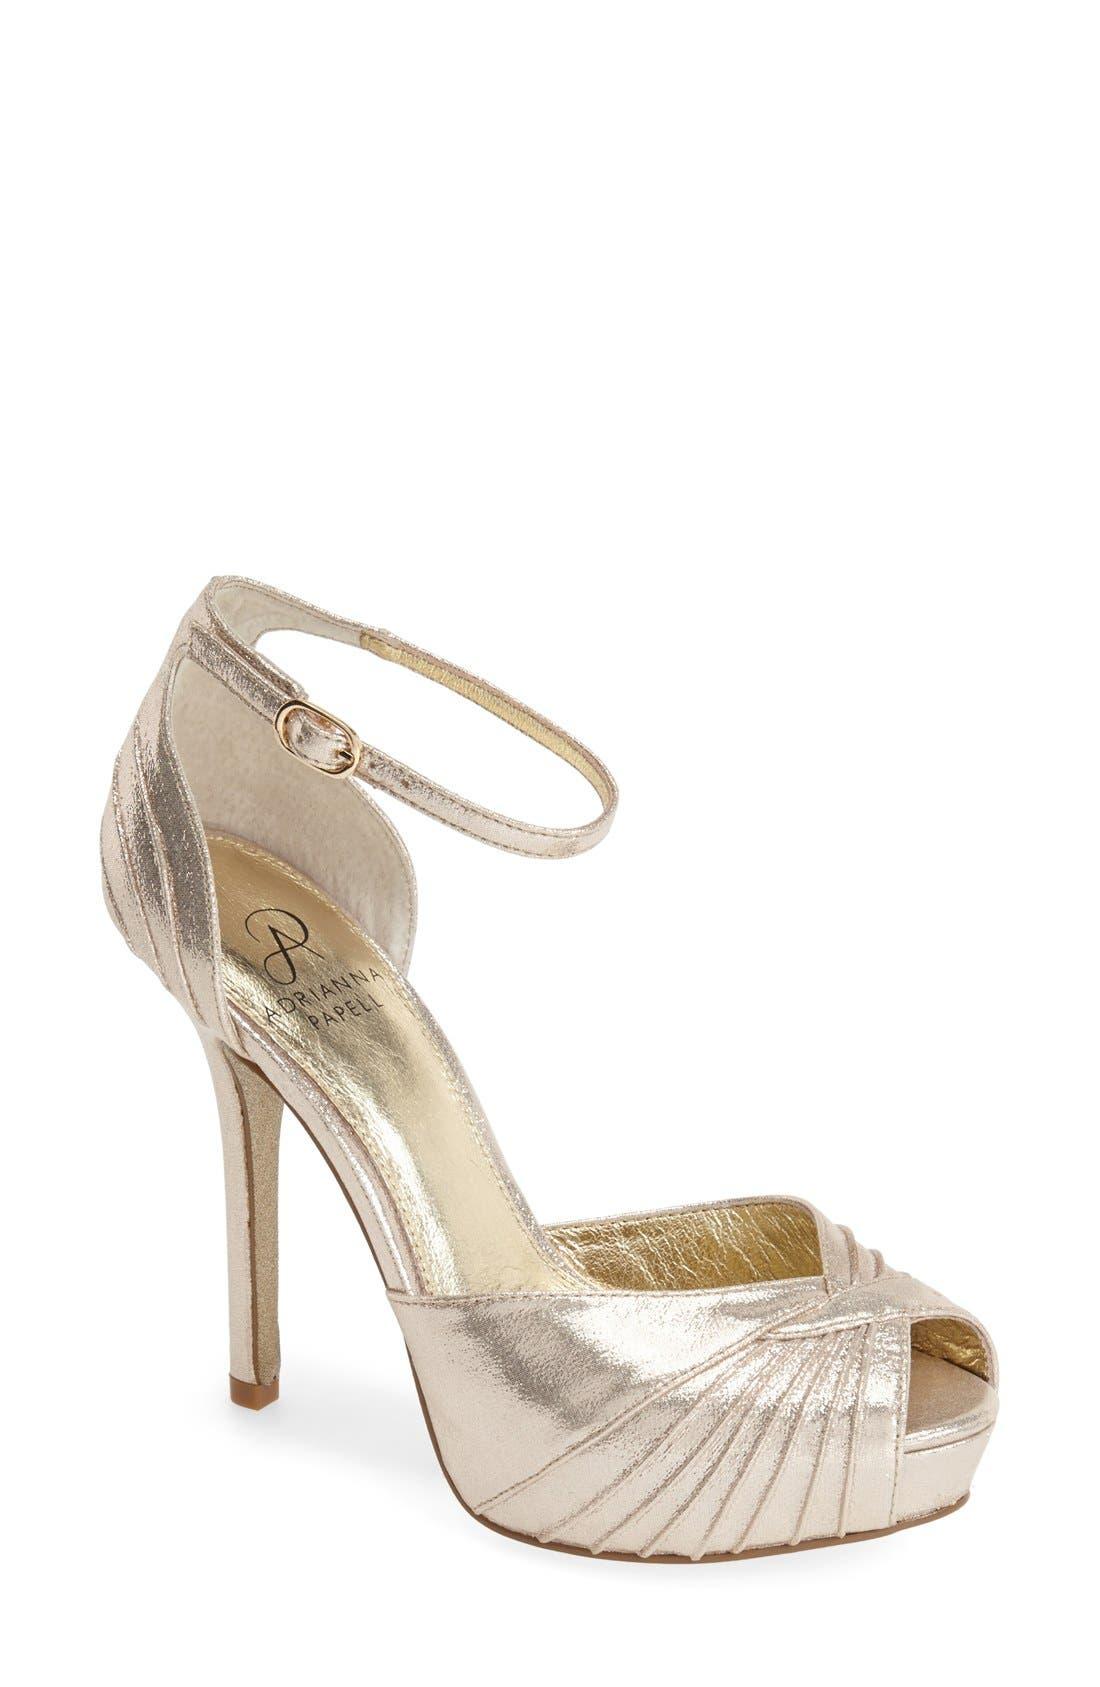 Alternate Image 1 Selected - Adrianna Papell 'Rebecca' Platform Sandal (Women)